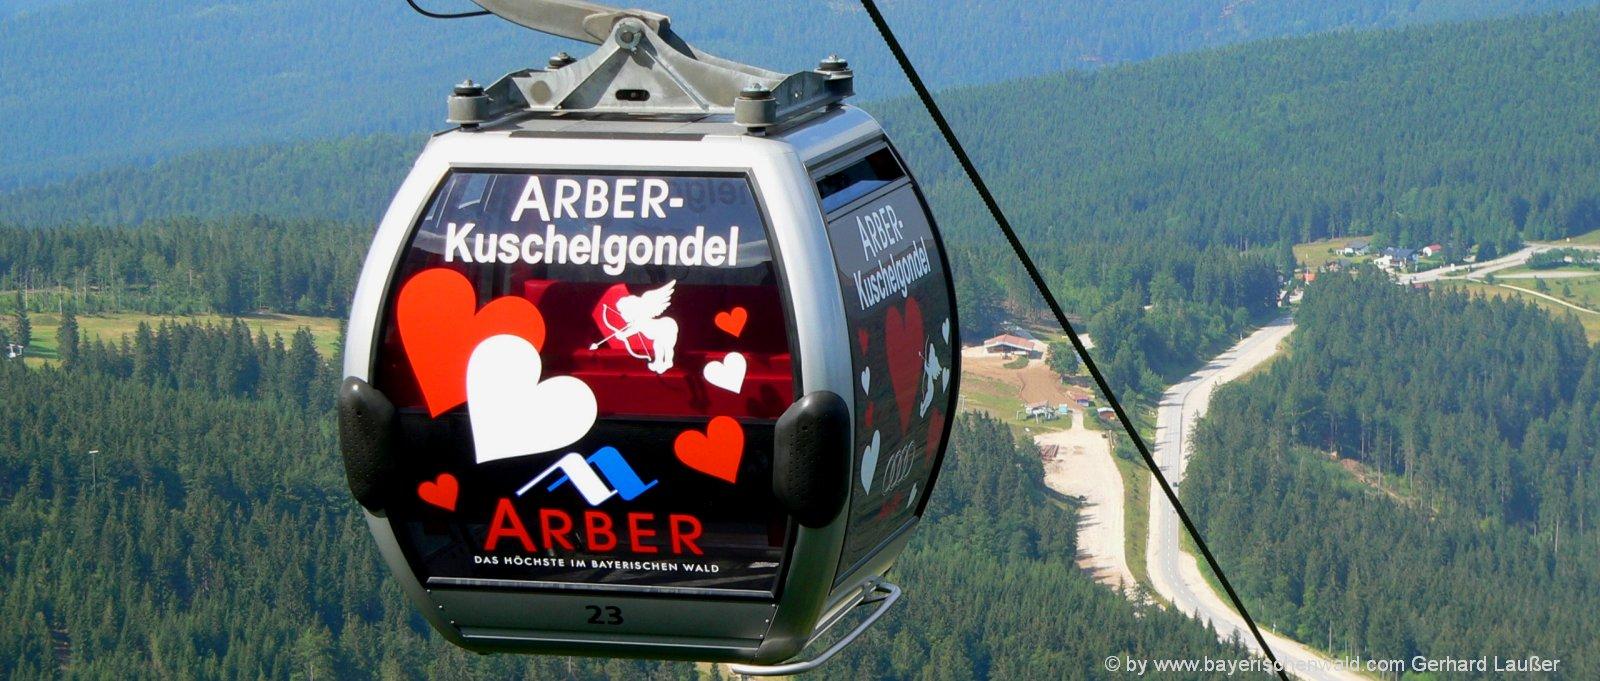 ausflugsziele-bayerischer-wald-romantikurlaub-kuschelurlaub